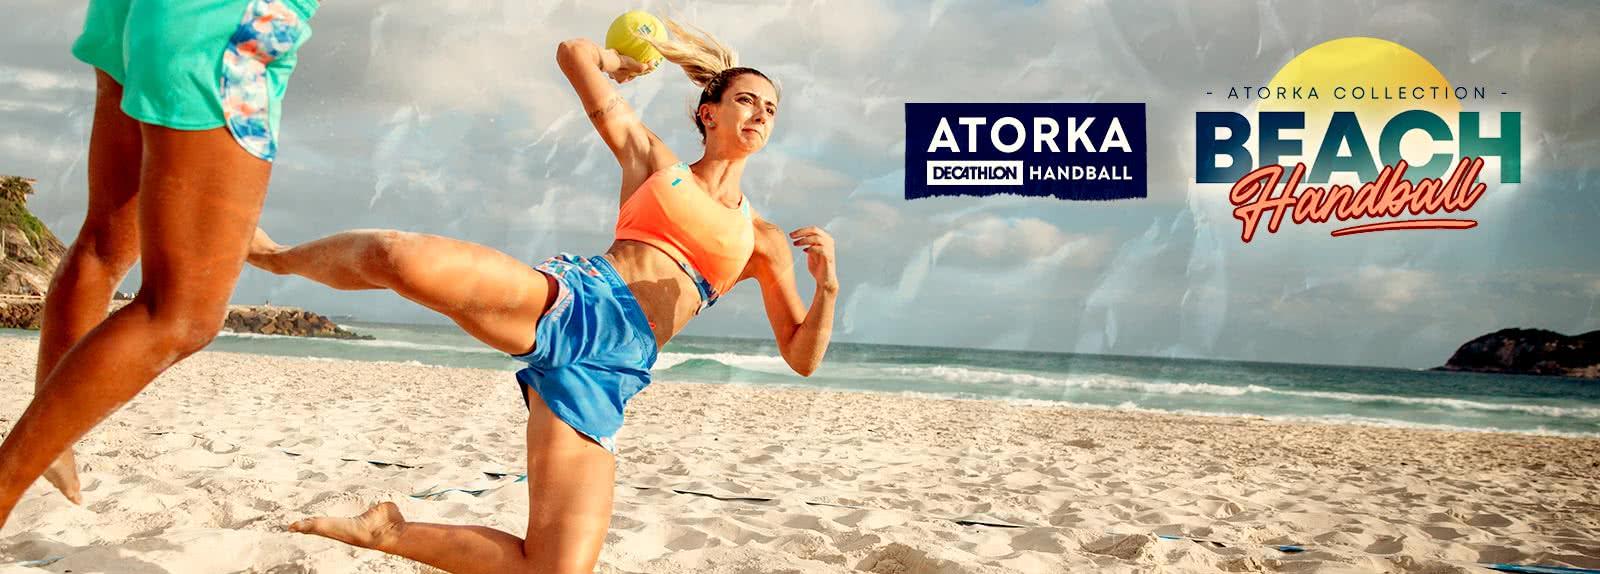 Atorka beach handball